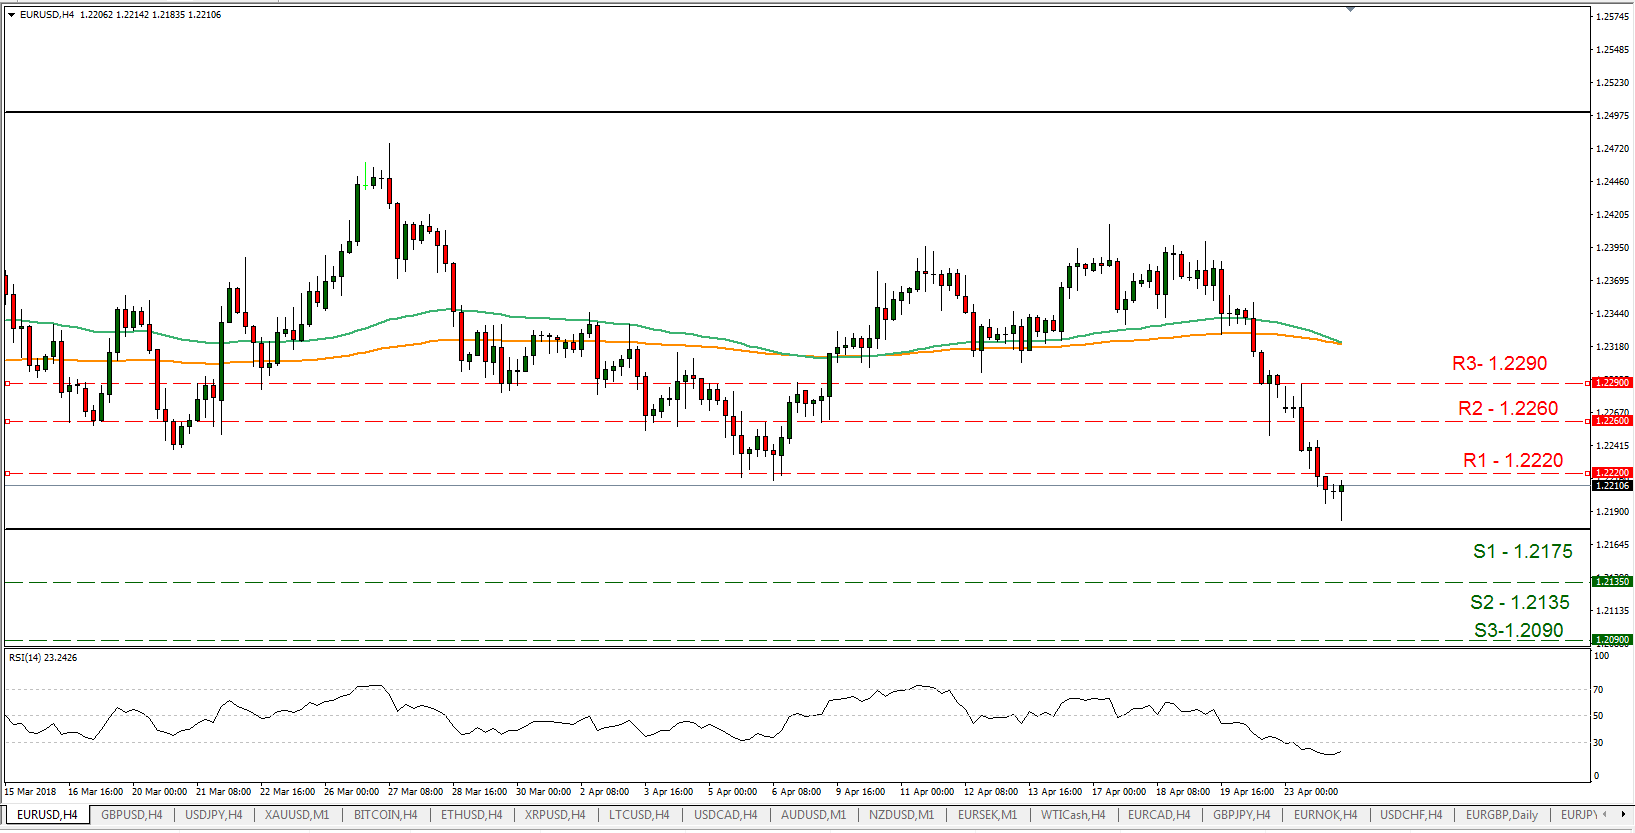 EUR/USD 24/04/2018 | EconAlerts